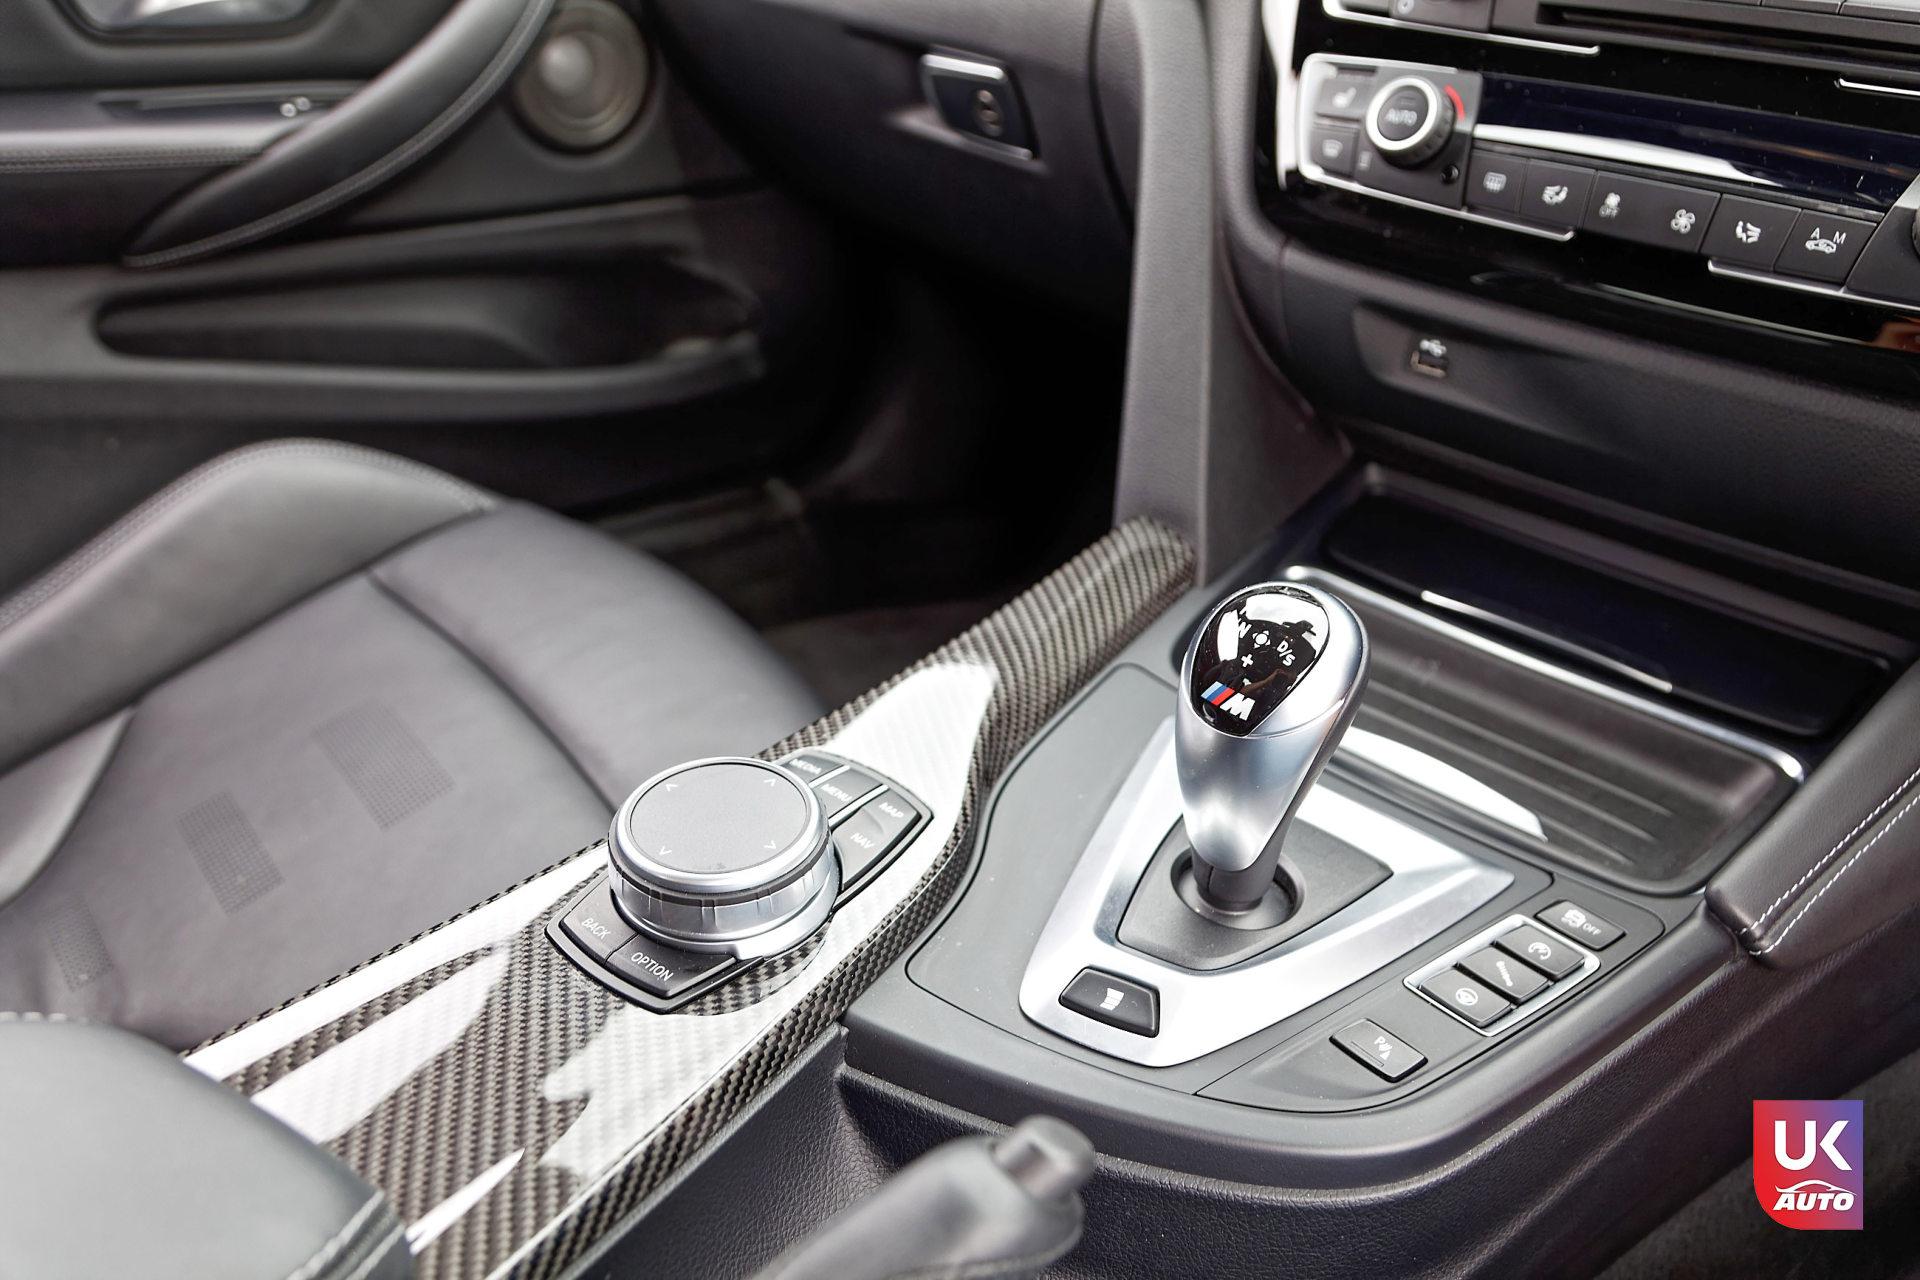 BMW M4 PACK COMPETITION BMW ANGLETERRE BMW IMPORT UK BMW MANDATAIRE AUTO11 DxO - IMPORTATION BMW M4 BMW IMPORT ROYAUME UNI BMW M4 COMPETITION RHD CLIENT UKAUTO